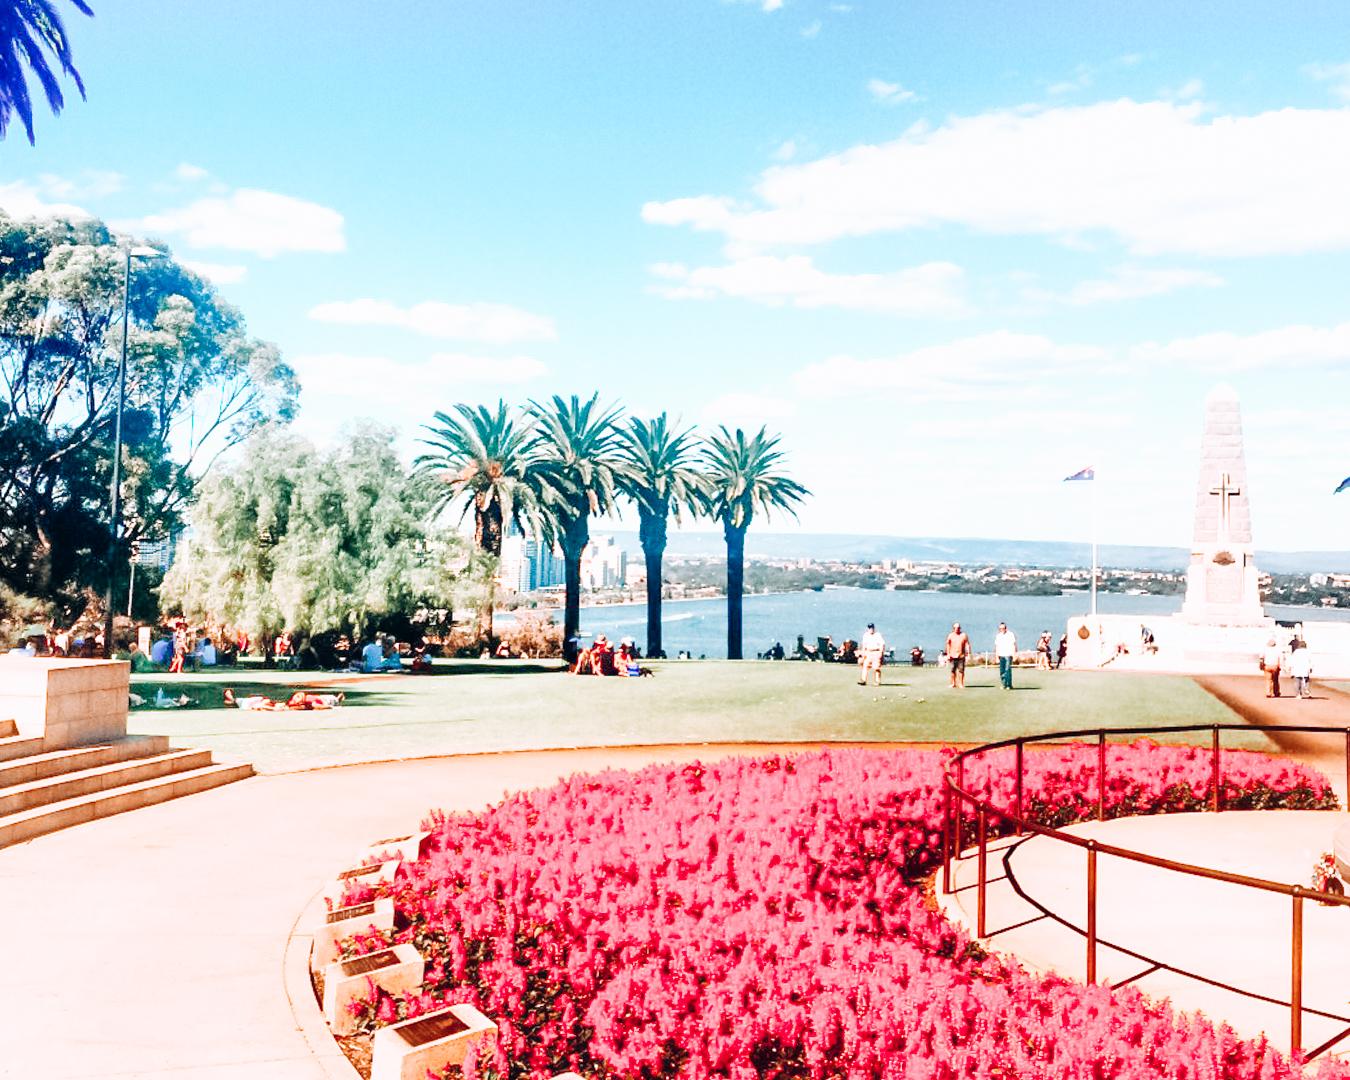 Kings Park in Perth